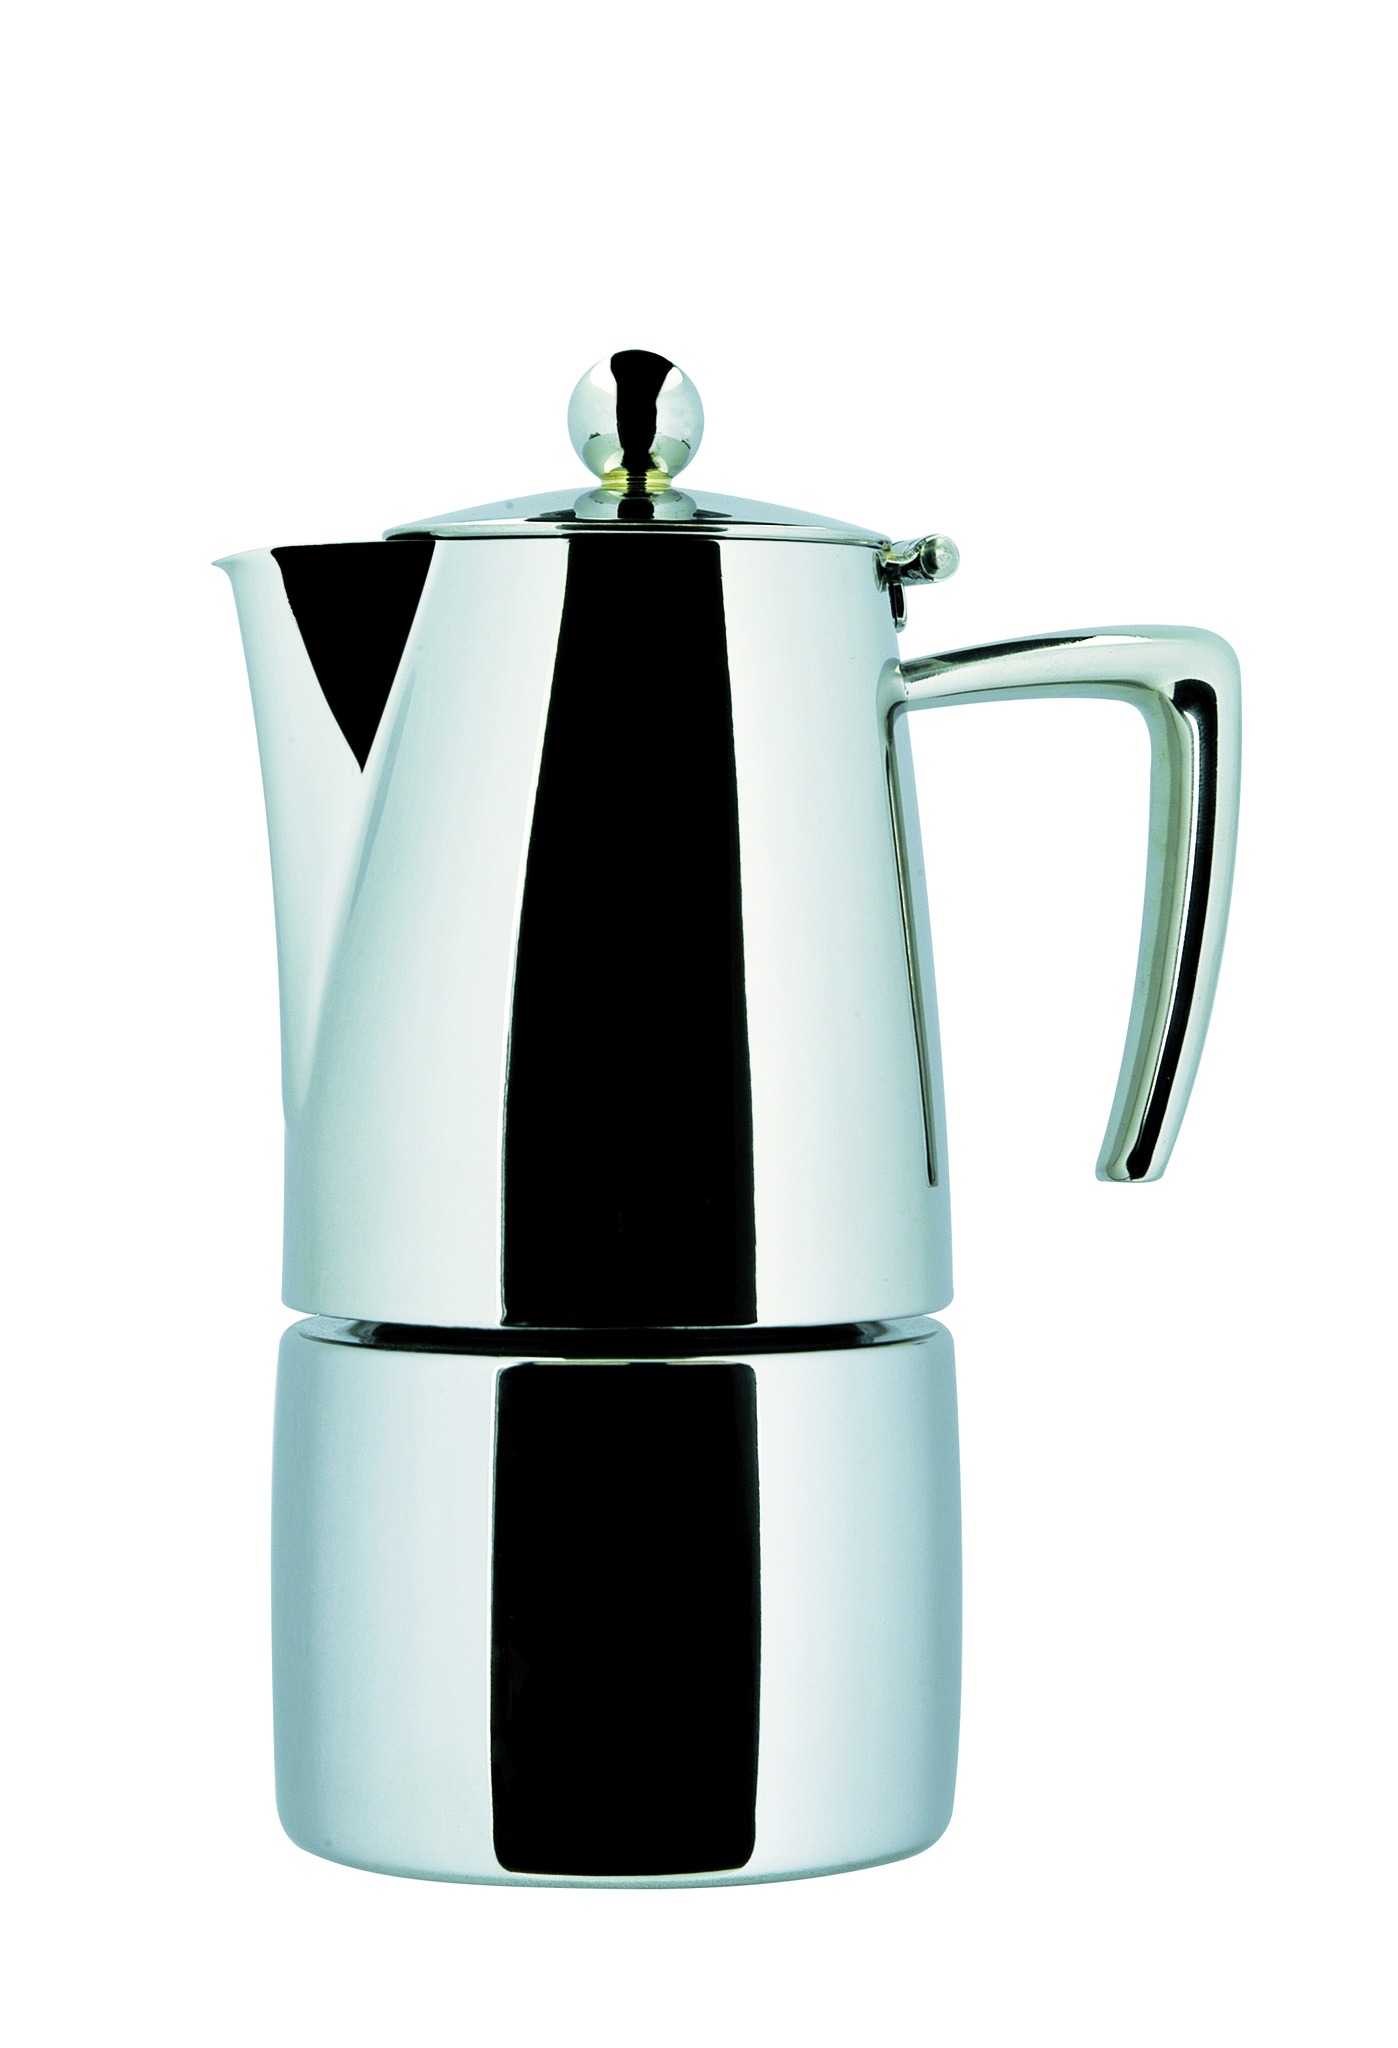 "ILSA Espressokocher ""Slancio"" aus Edelstahl 15cl / 2 Tassen"